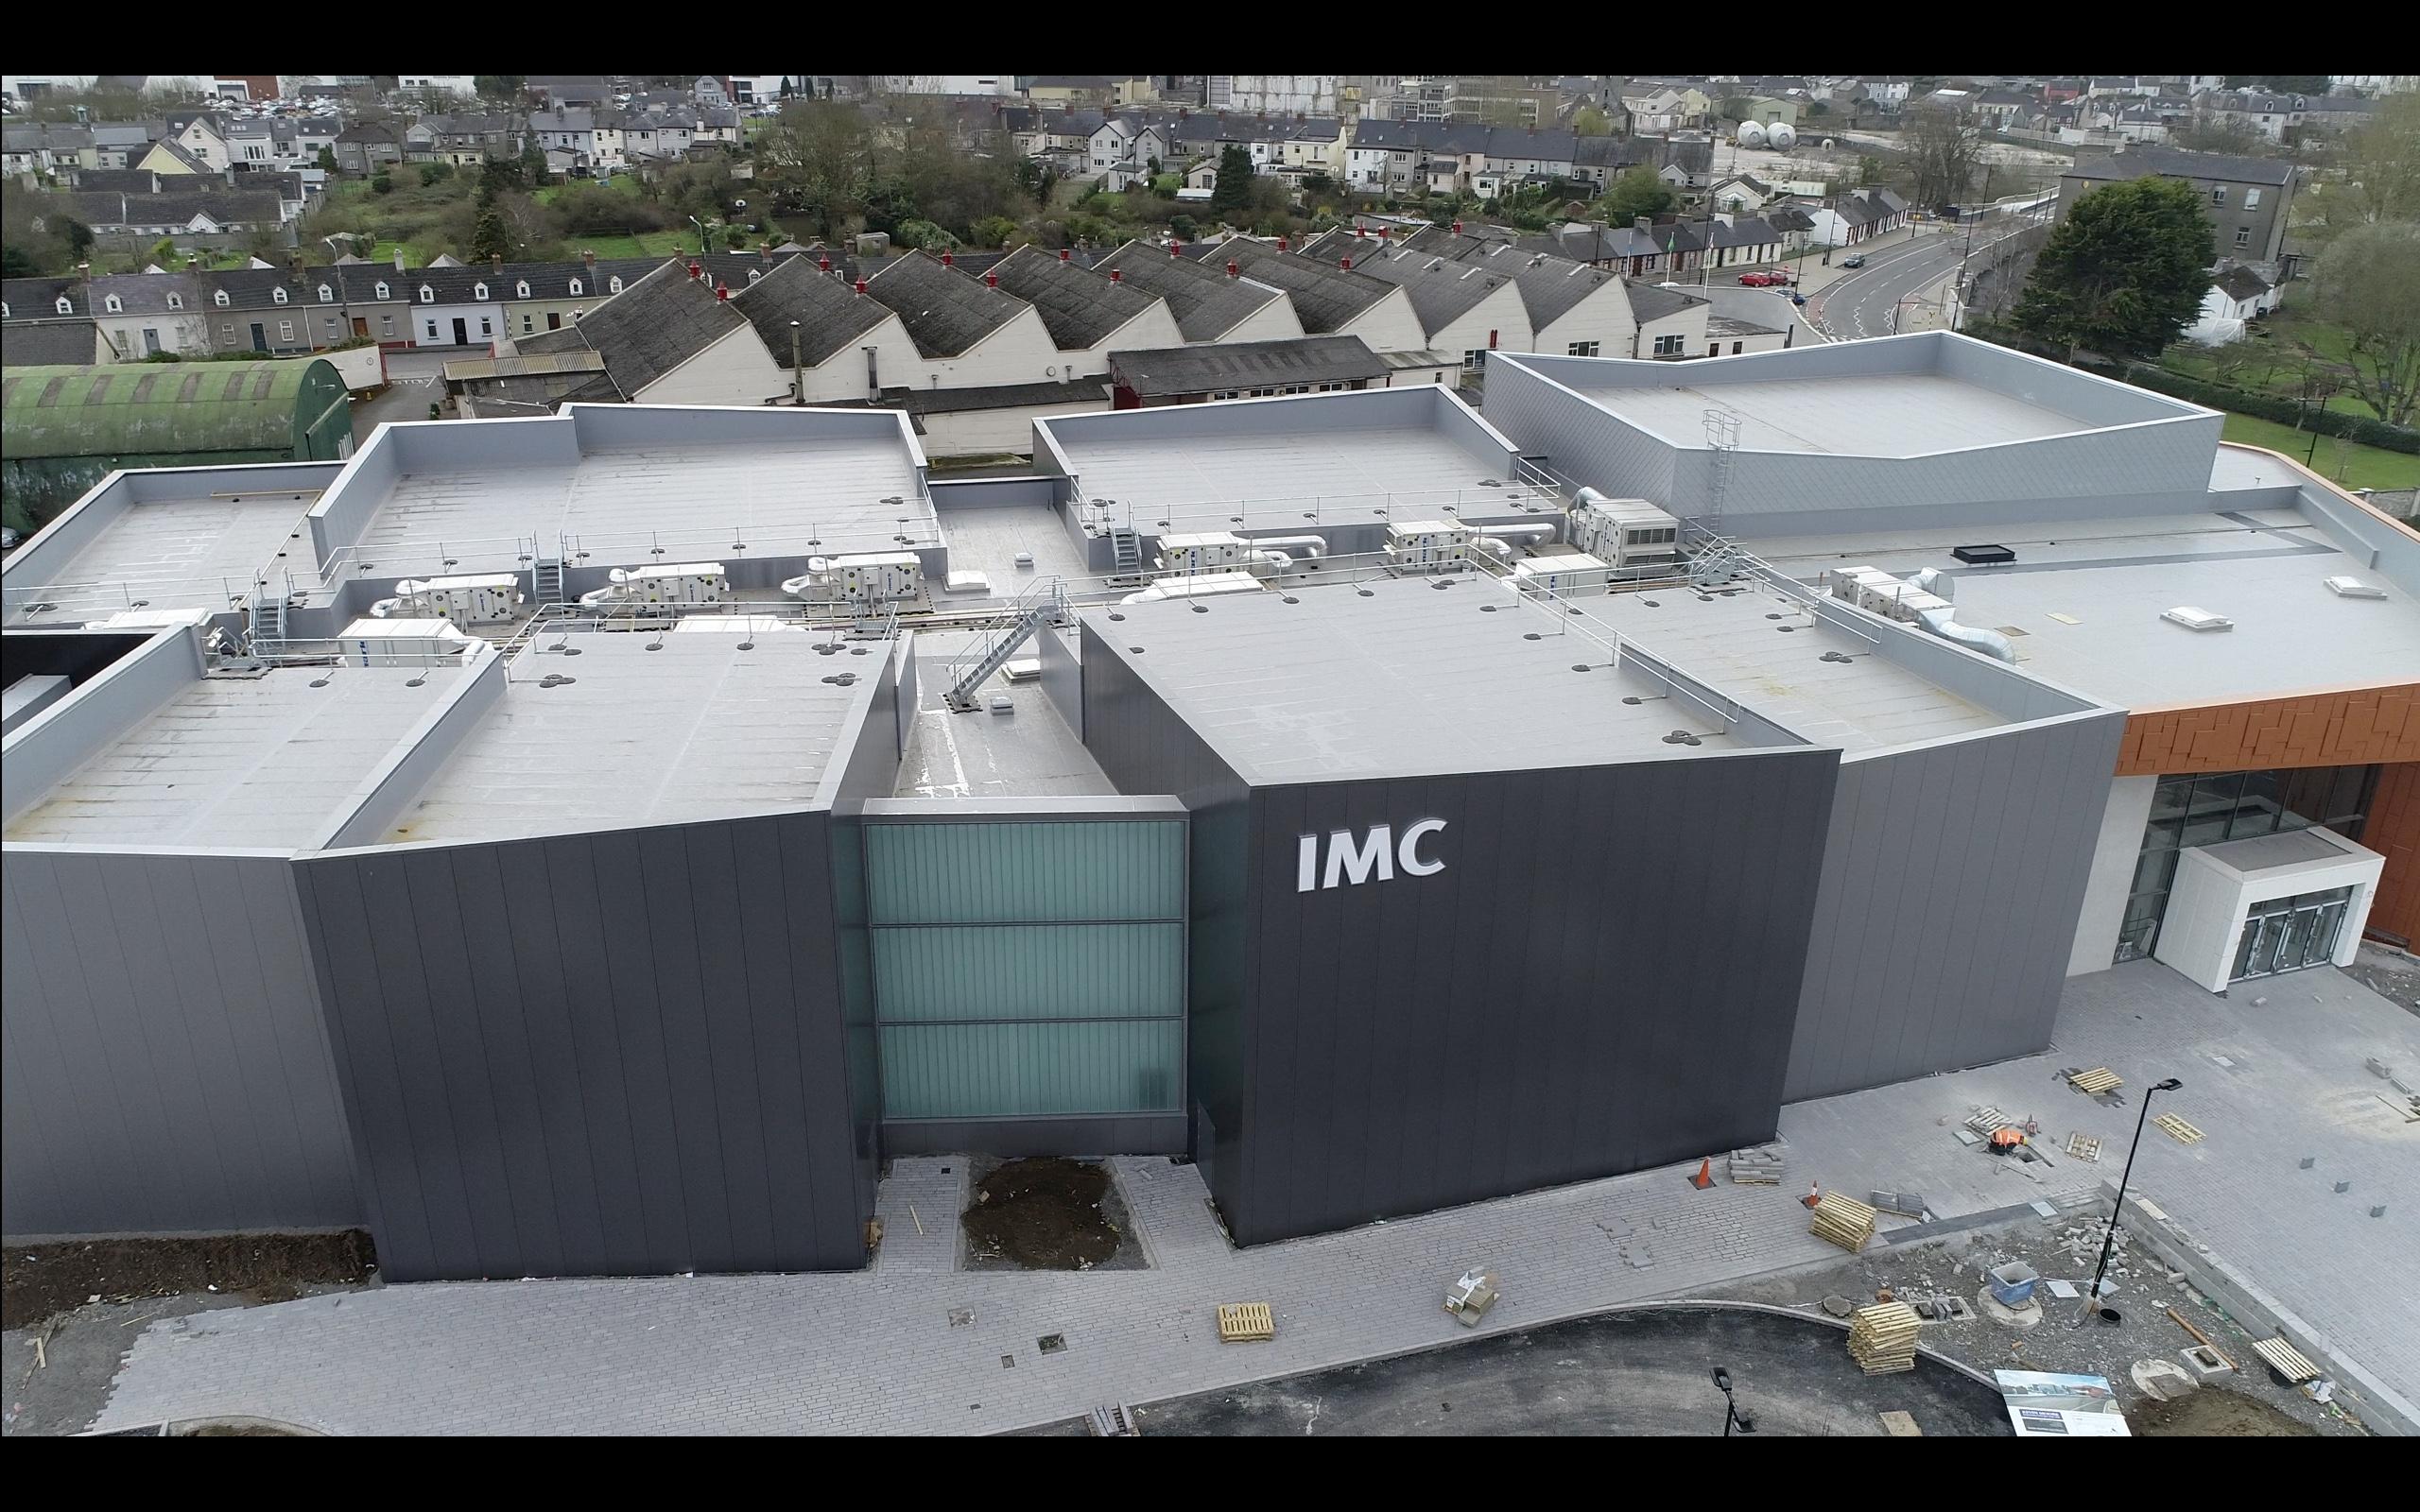 Kilkenny IMC Cinema Nearly Complete